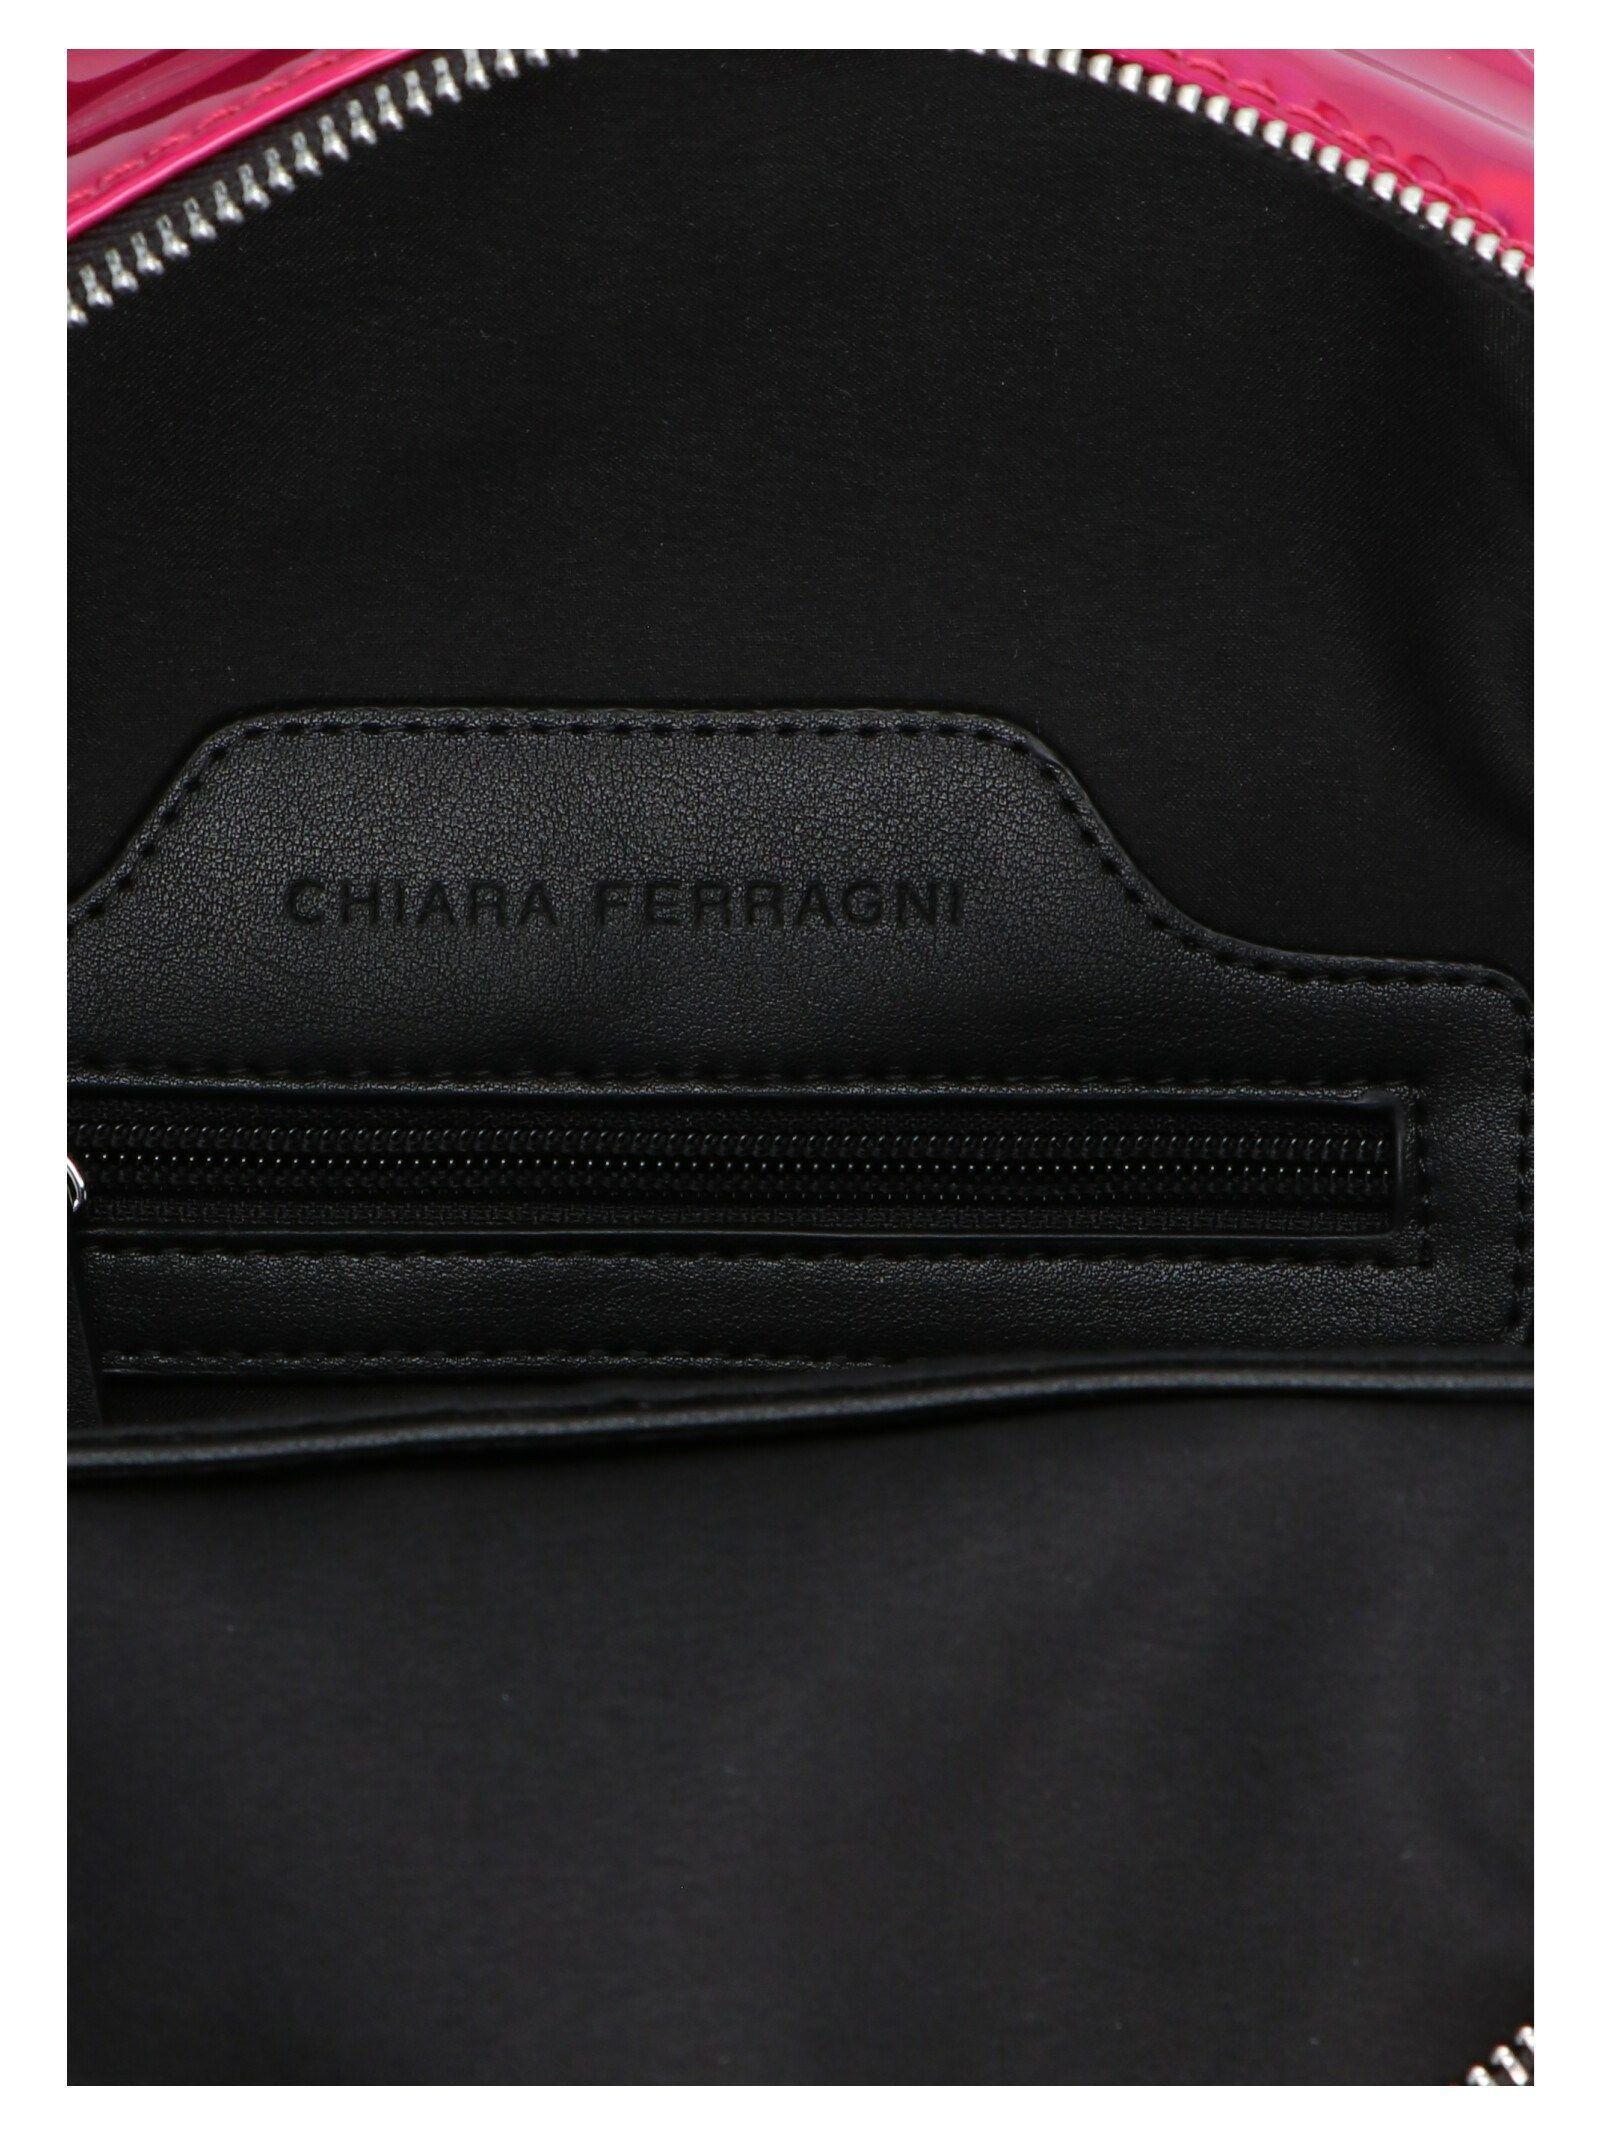 CHIARA FERRAGNI WOMEN'S CFZ2069PINK FUCHSIA PVC BACKPACK